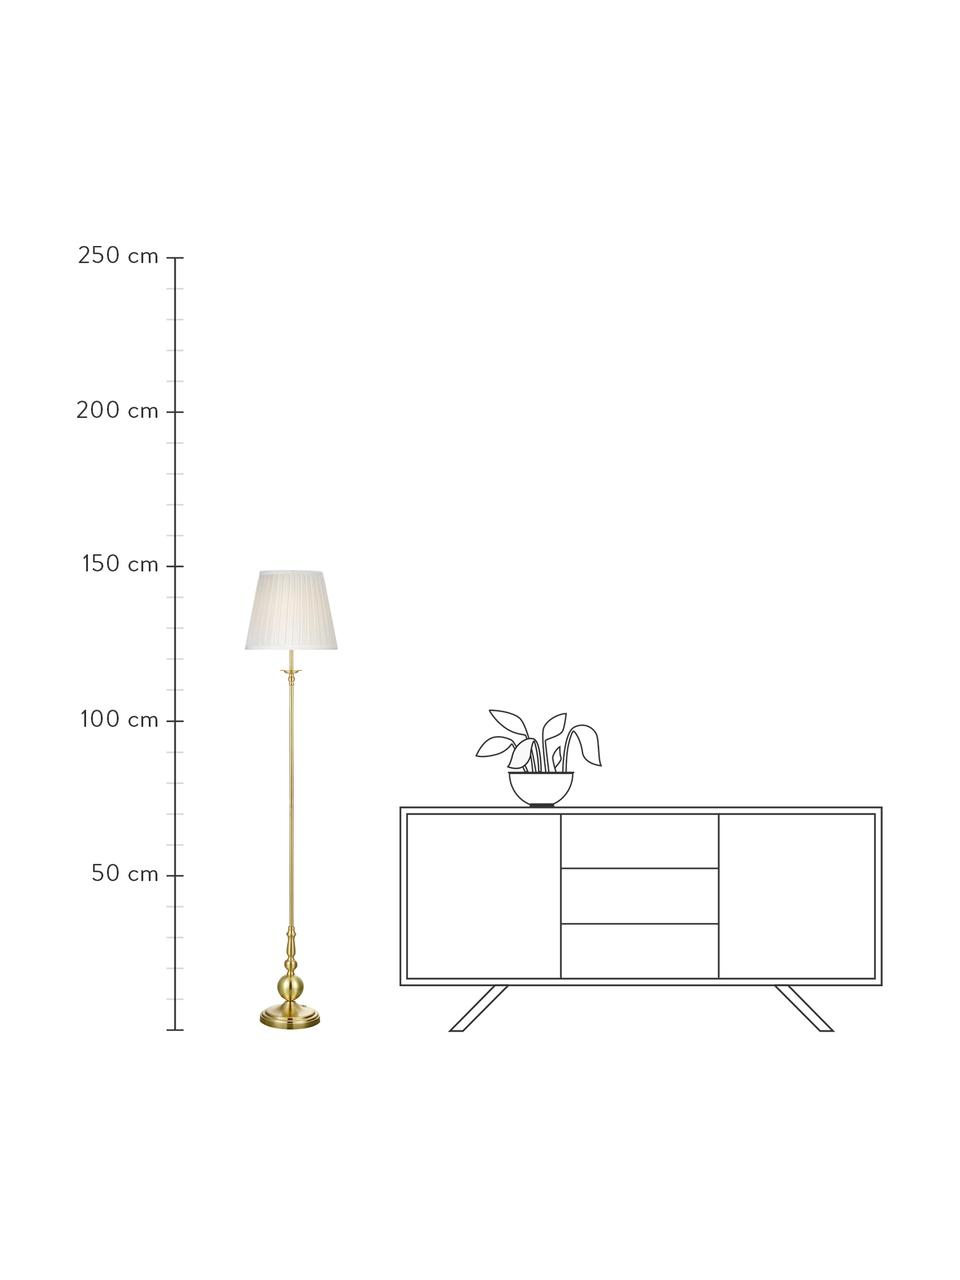 Stehlampe Imperia in Messing, Lampenschirm: Polyester, Lampenfuß: Metall, vermessingt, Weiß,Messing, Ø 30 x H 149 cm